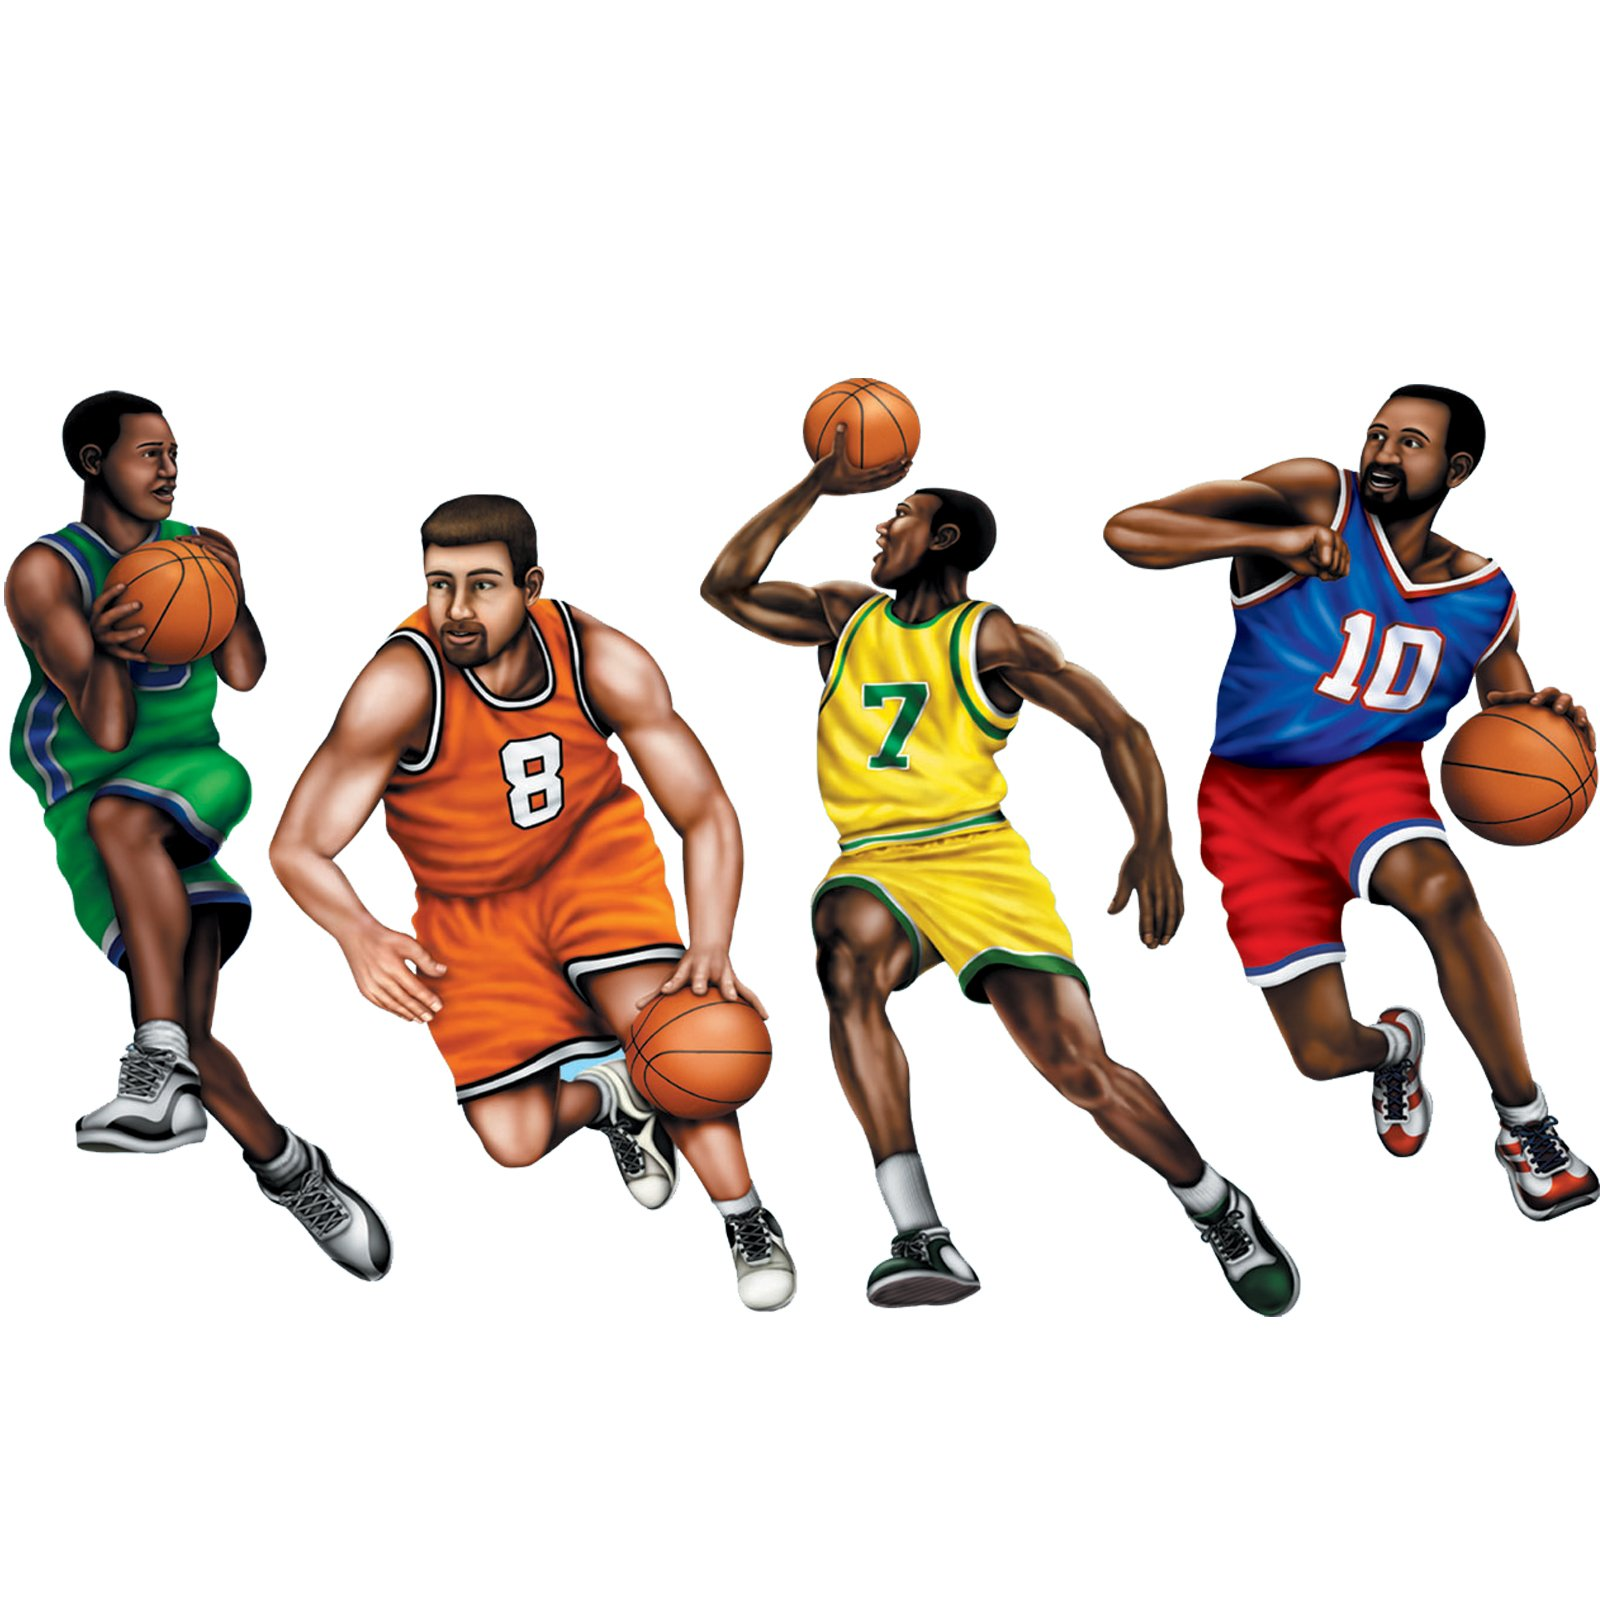 1600x1600 Dunk Basketball Player Silhouette Clipart